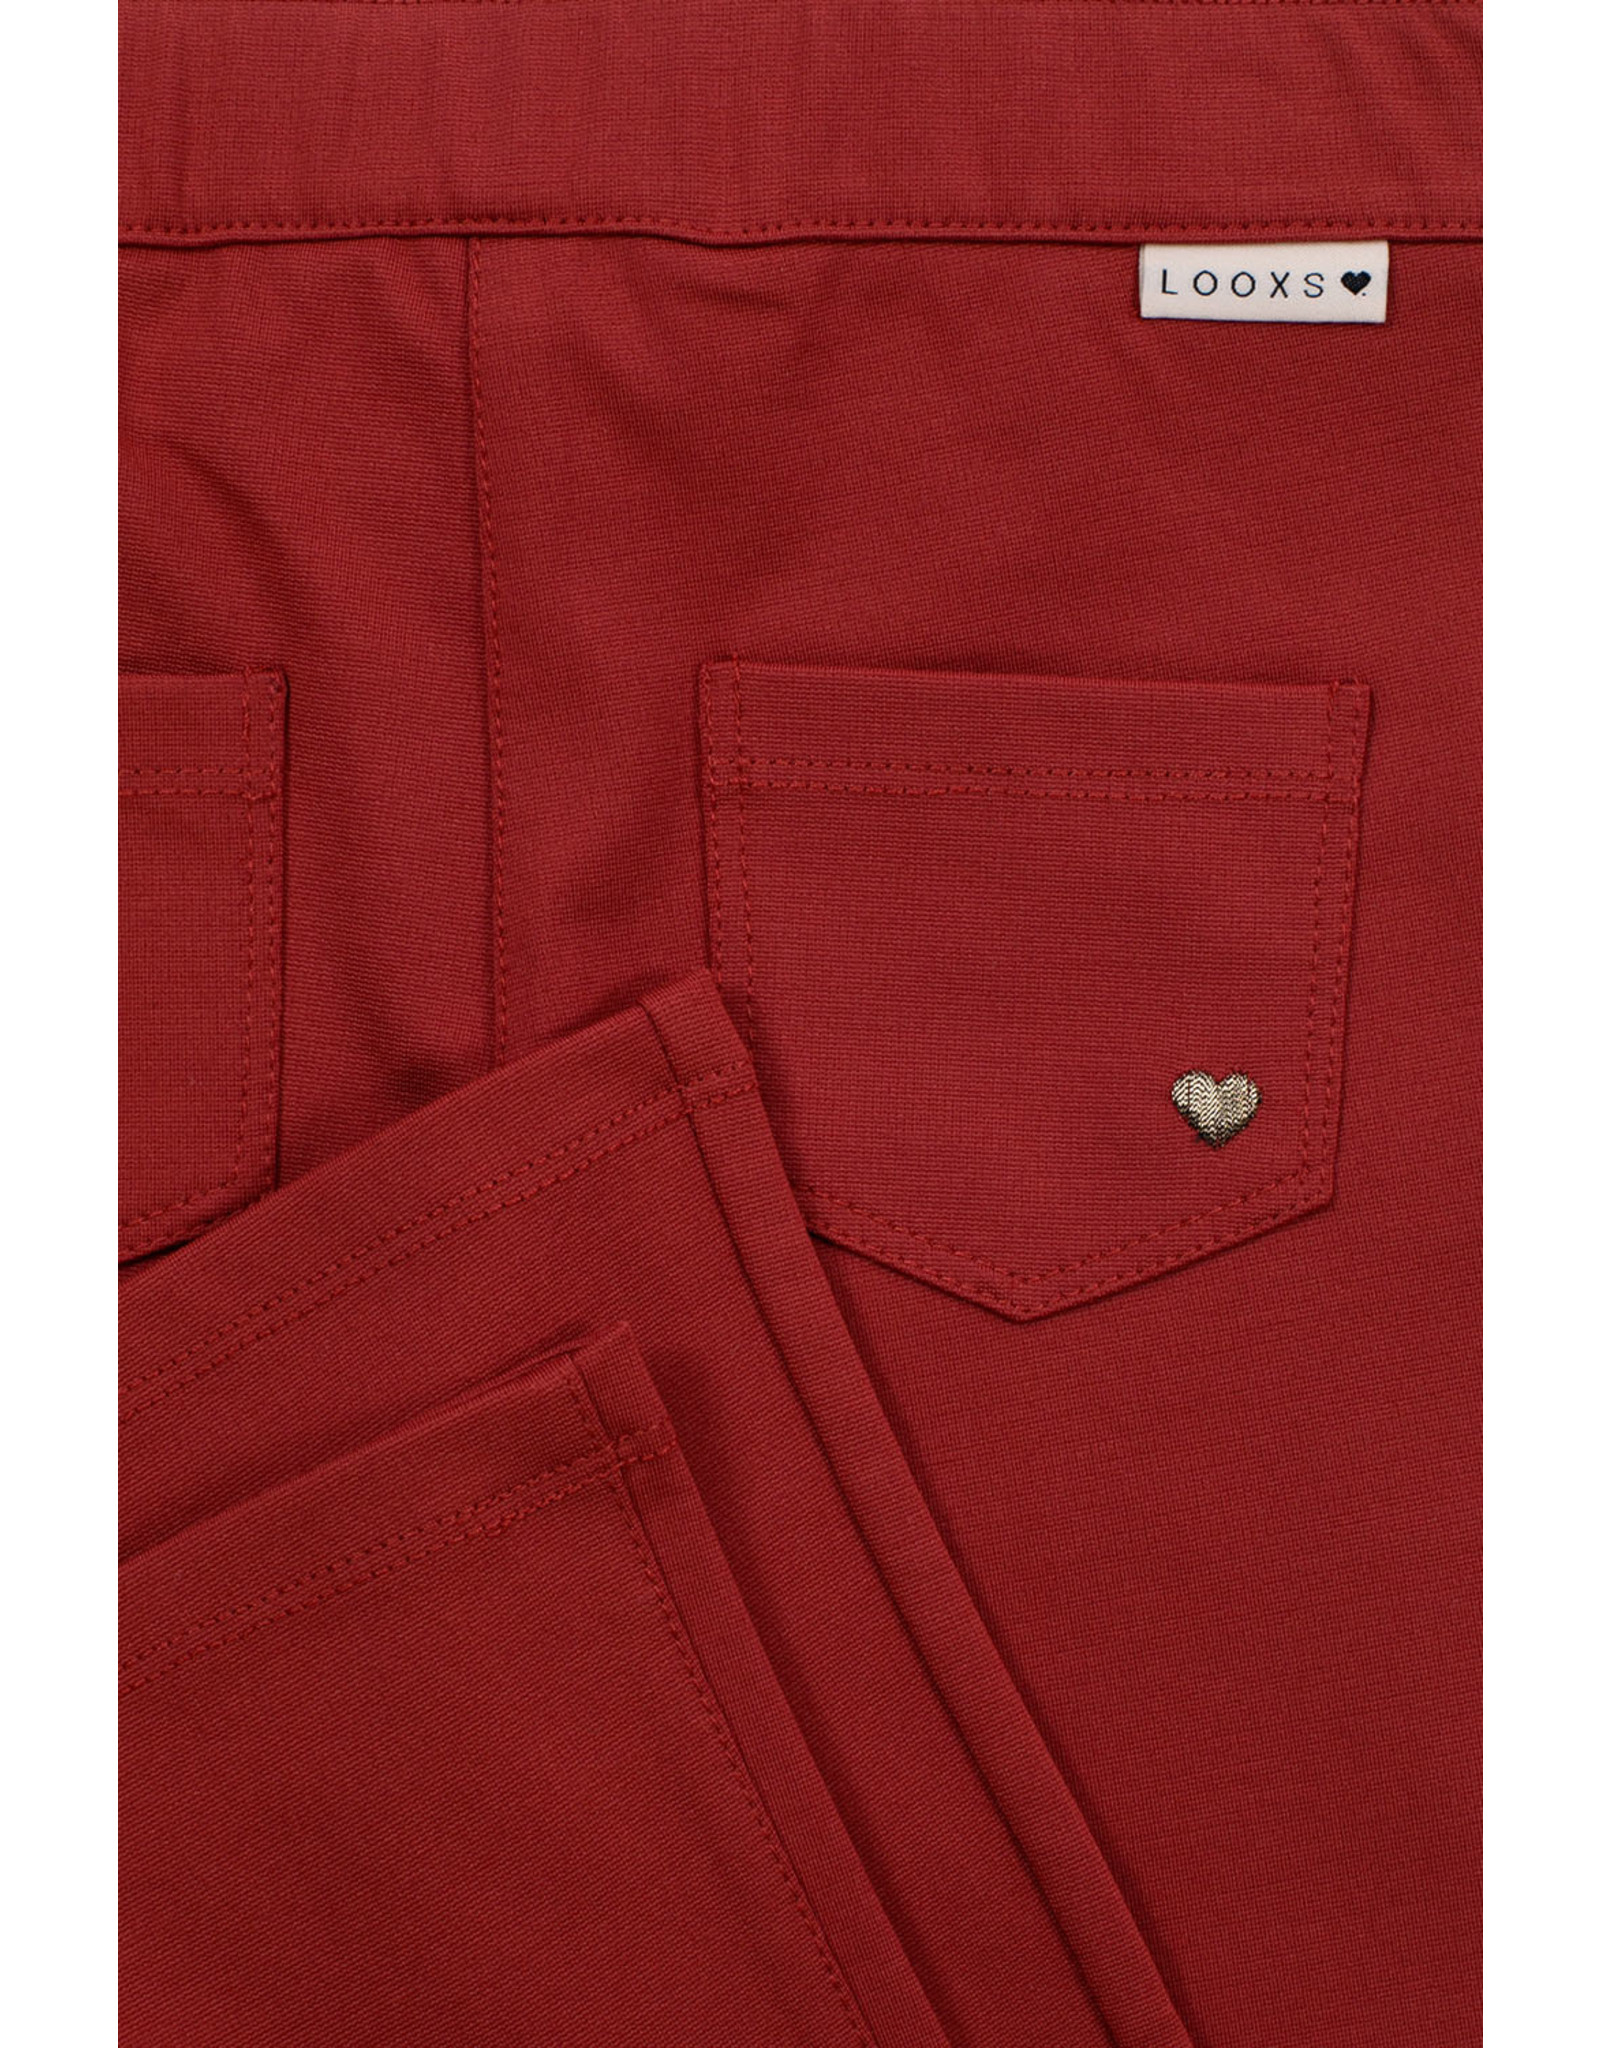 LOOXS Little Flair pants